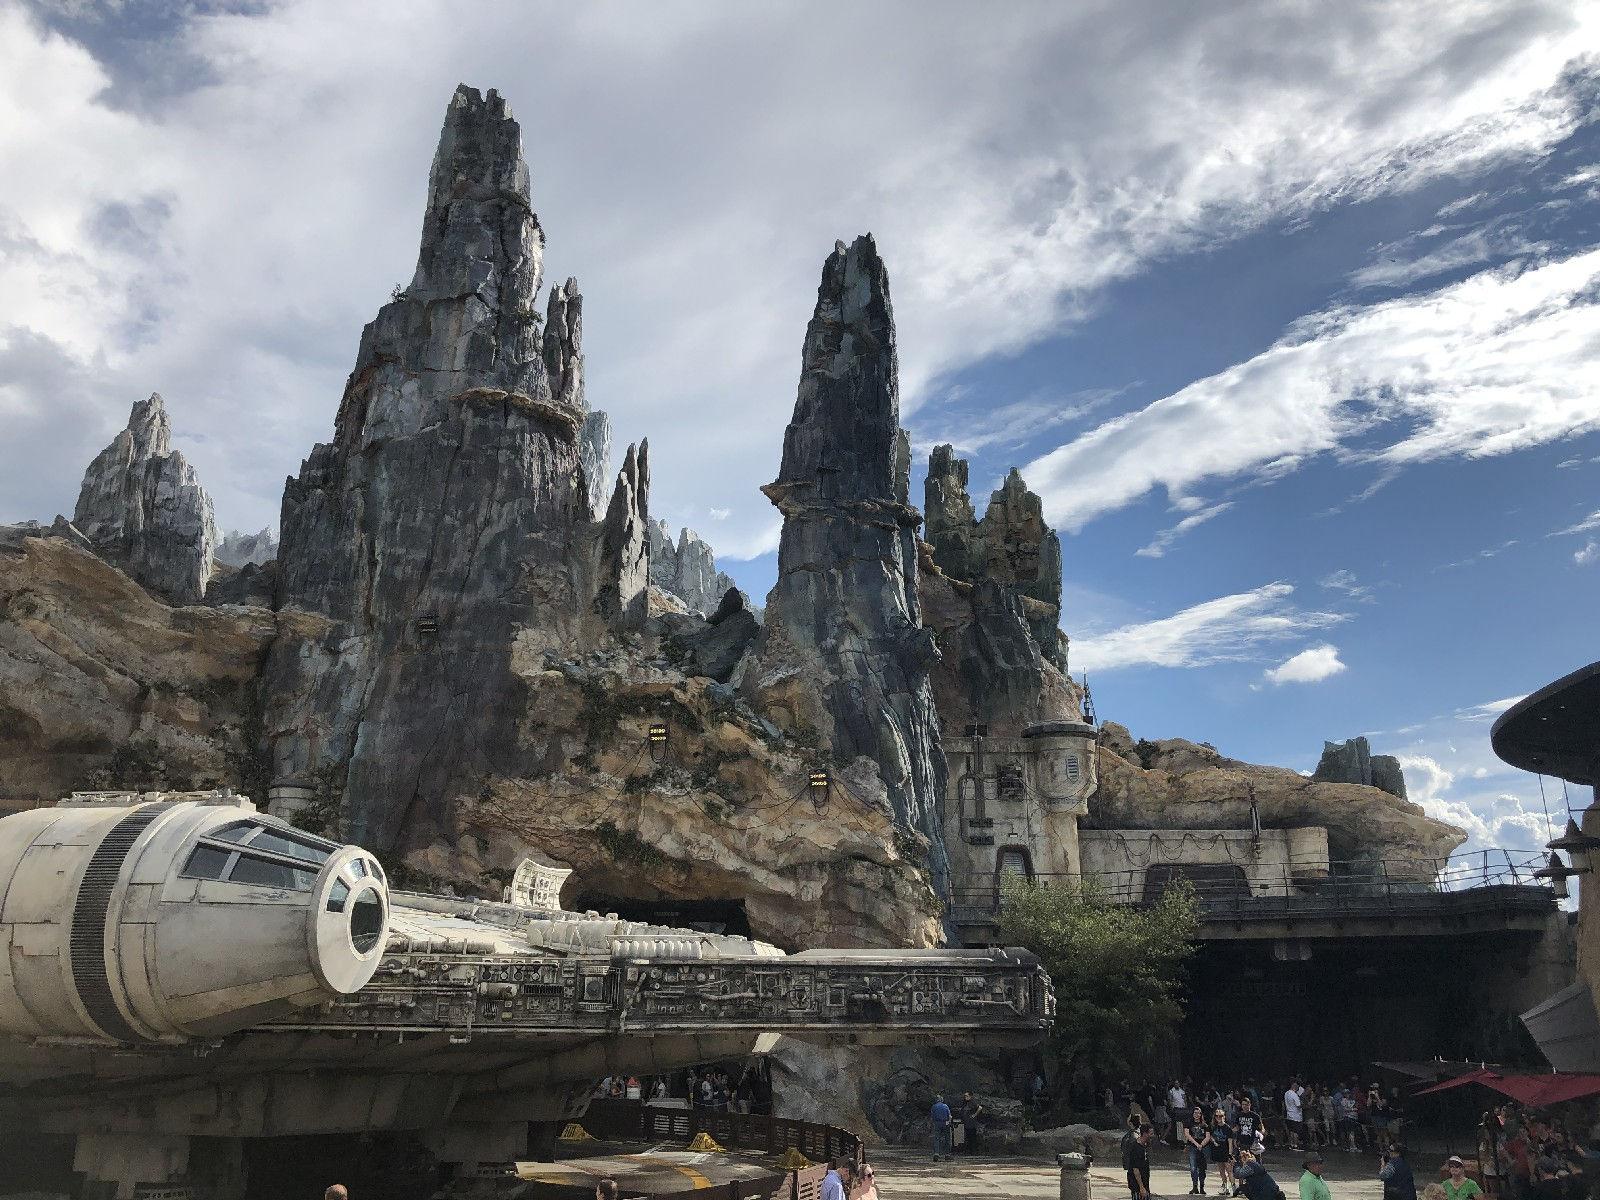 Visiting Star Wars Galaxy's Edge at Walt Disney World